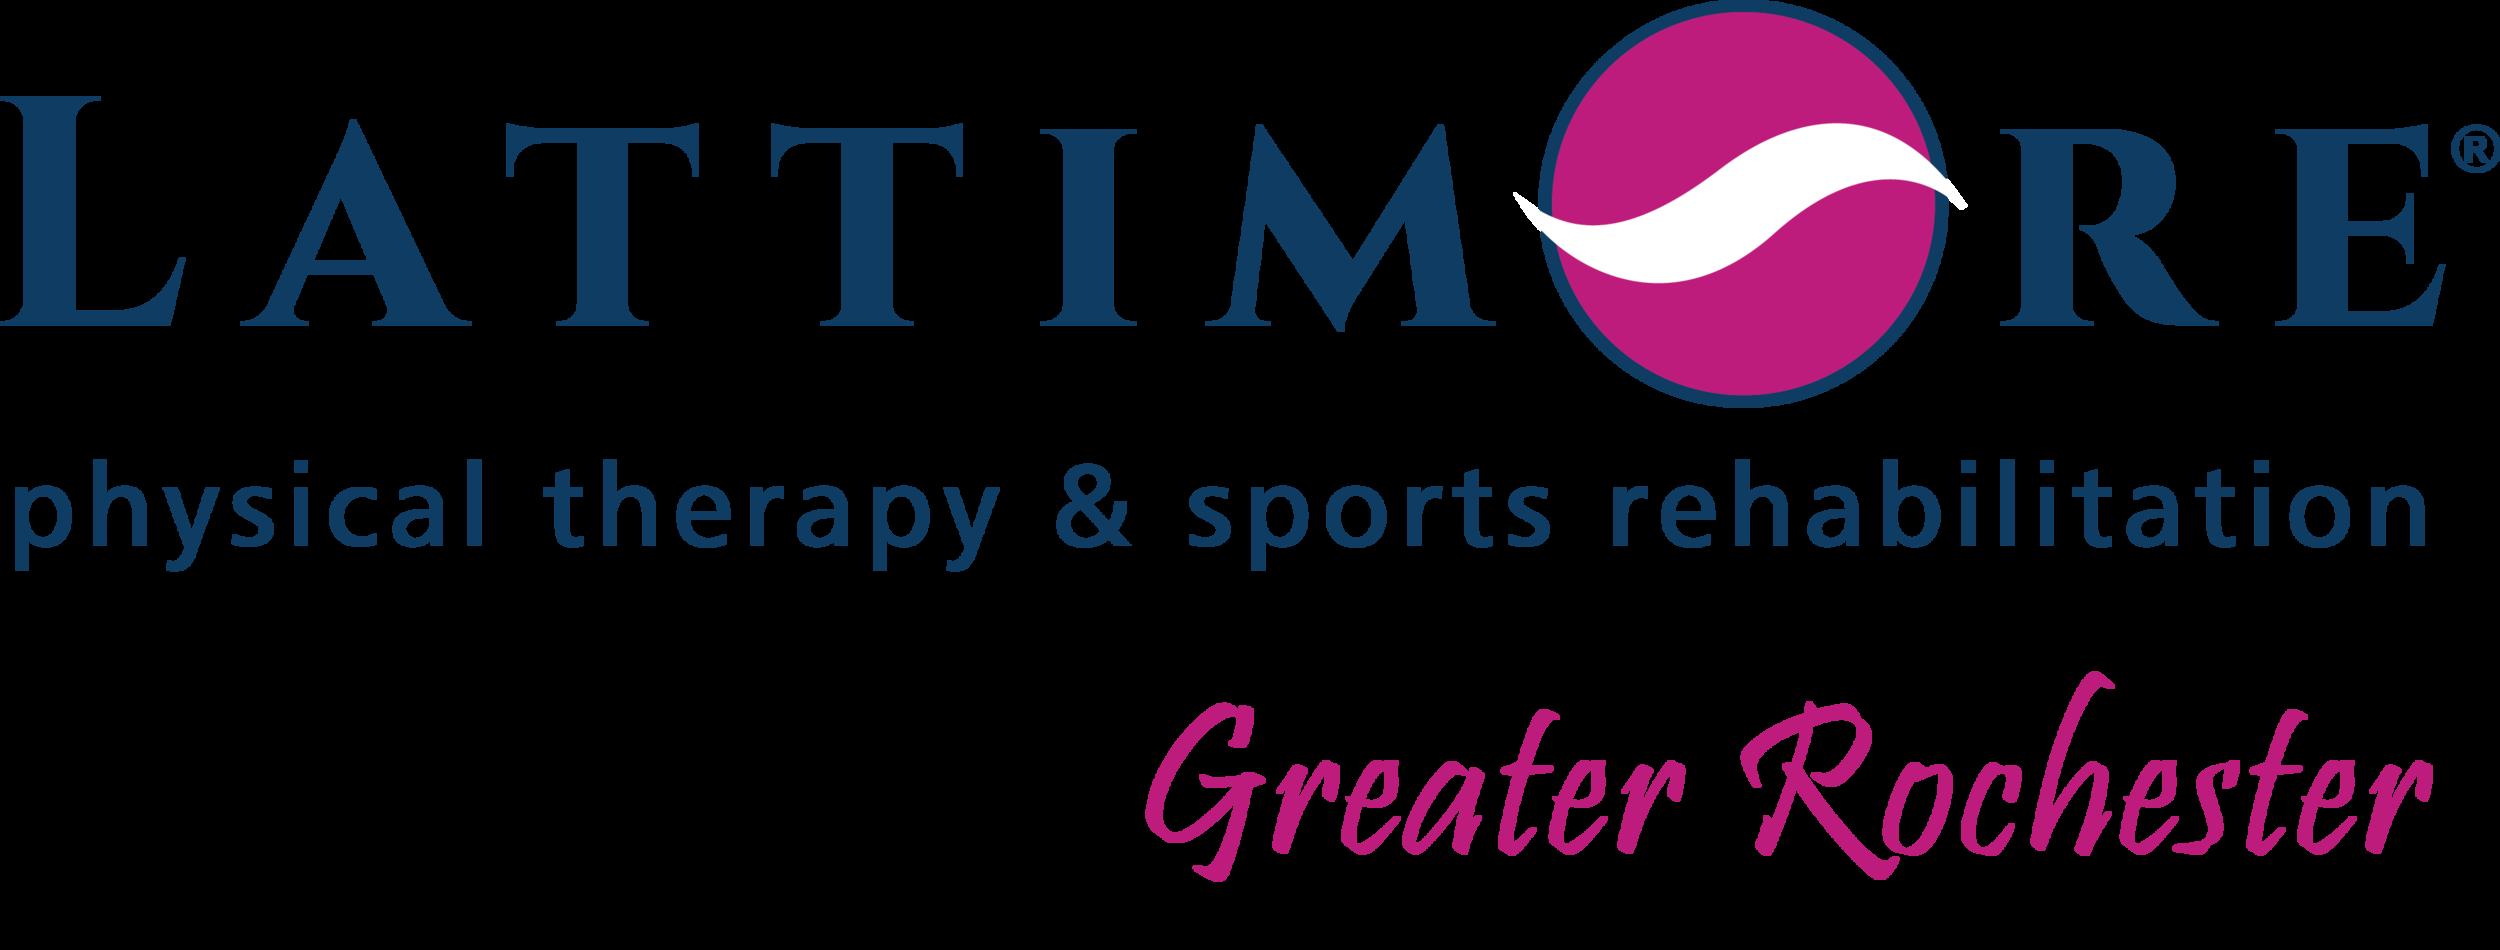 2019-05_Lattimore-Logo-GreaterRochester.png